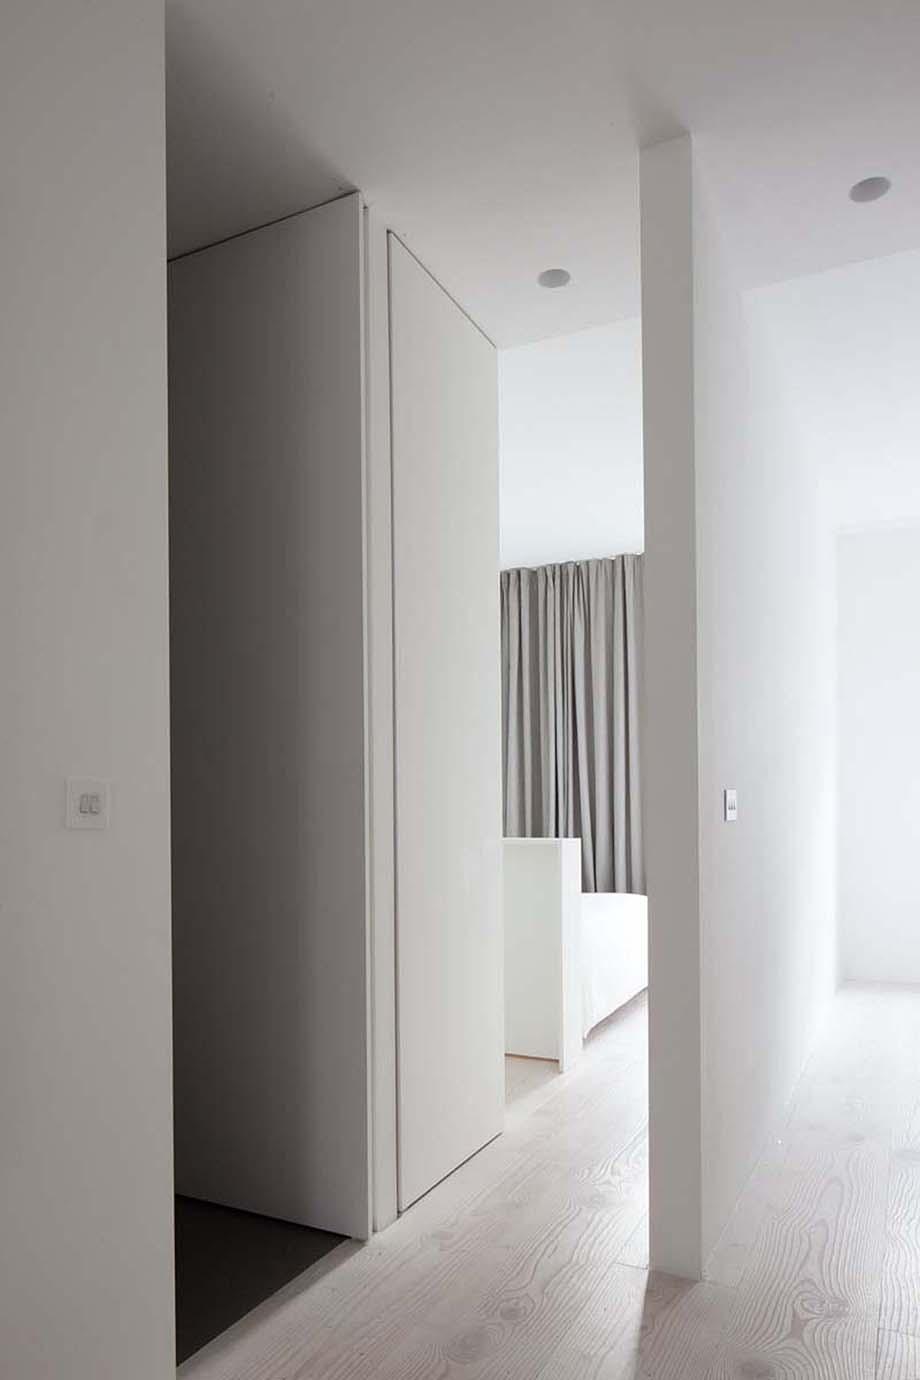 apartamento bankside en londres hasa architects (2)